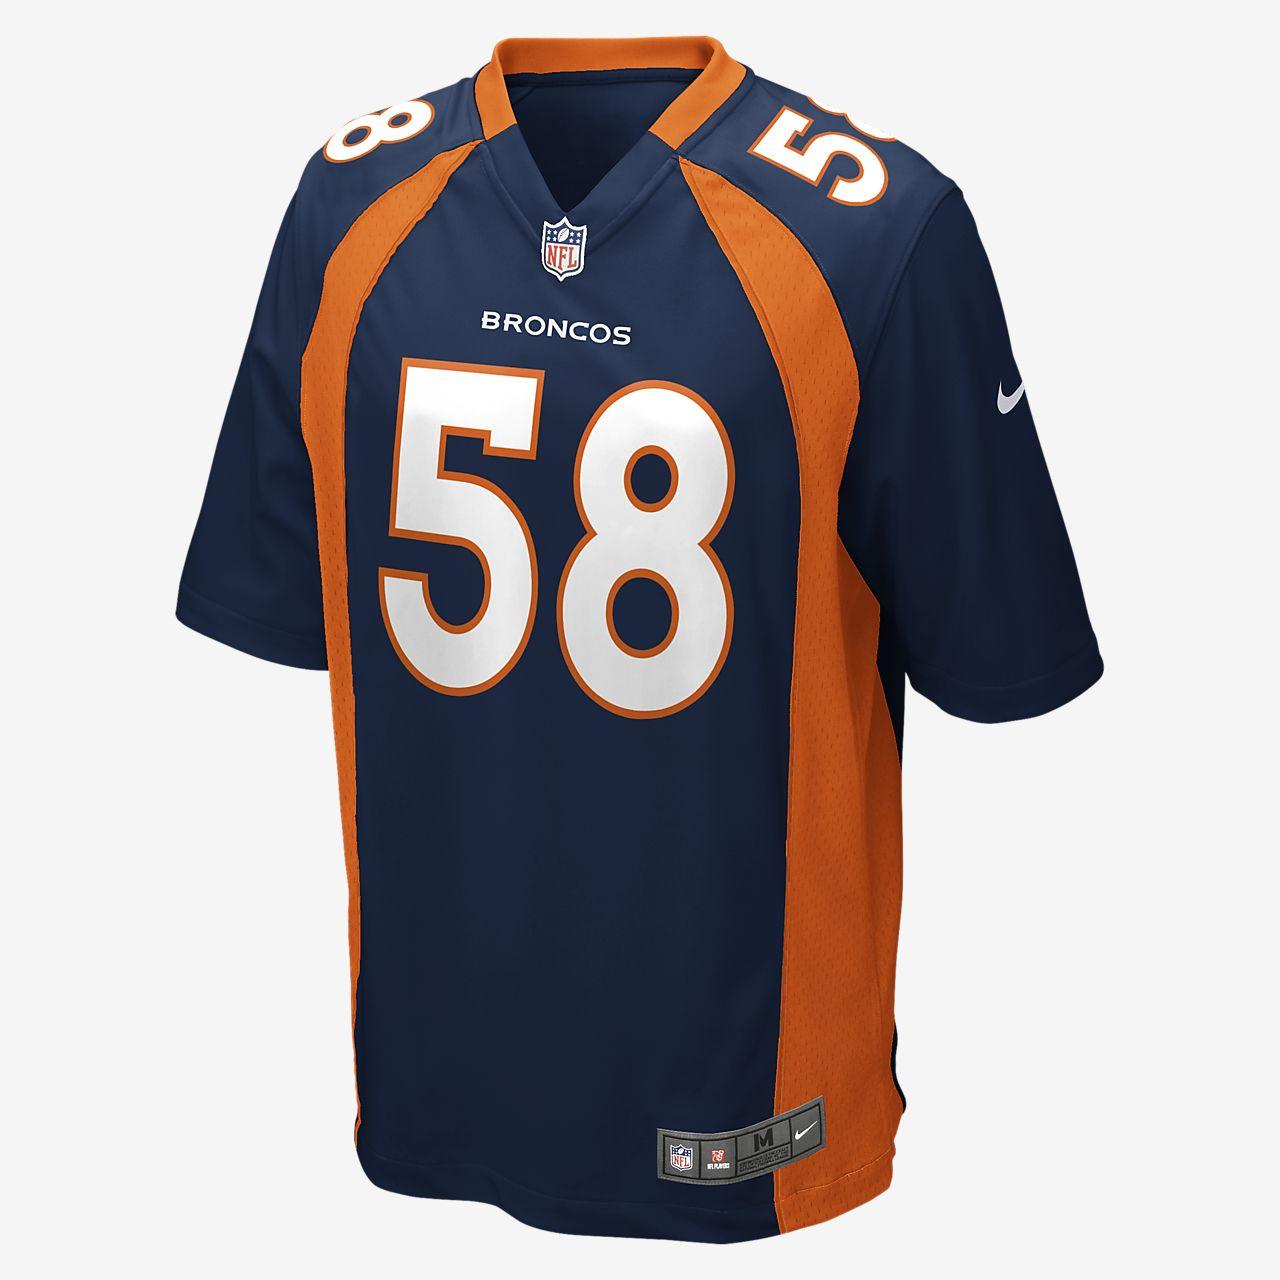 b80523f5f NFL Denver Broncos (Von Miller) Men's Football Alternate Game Jersey ...